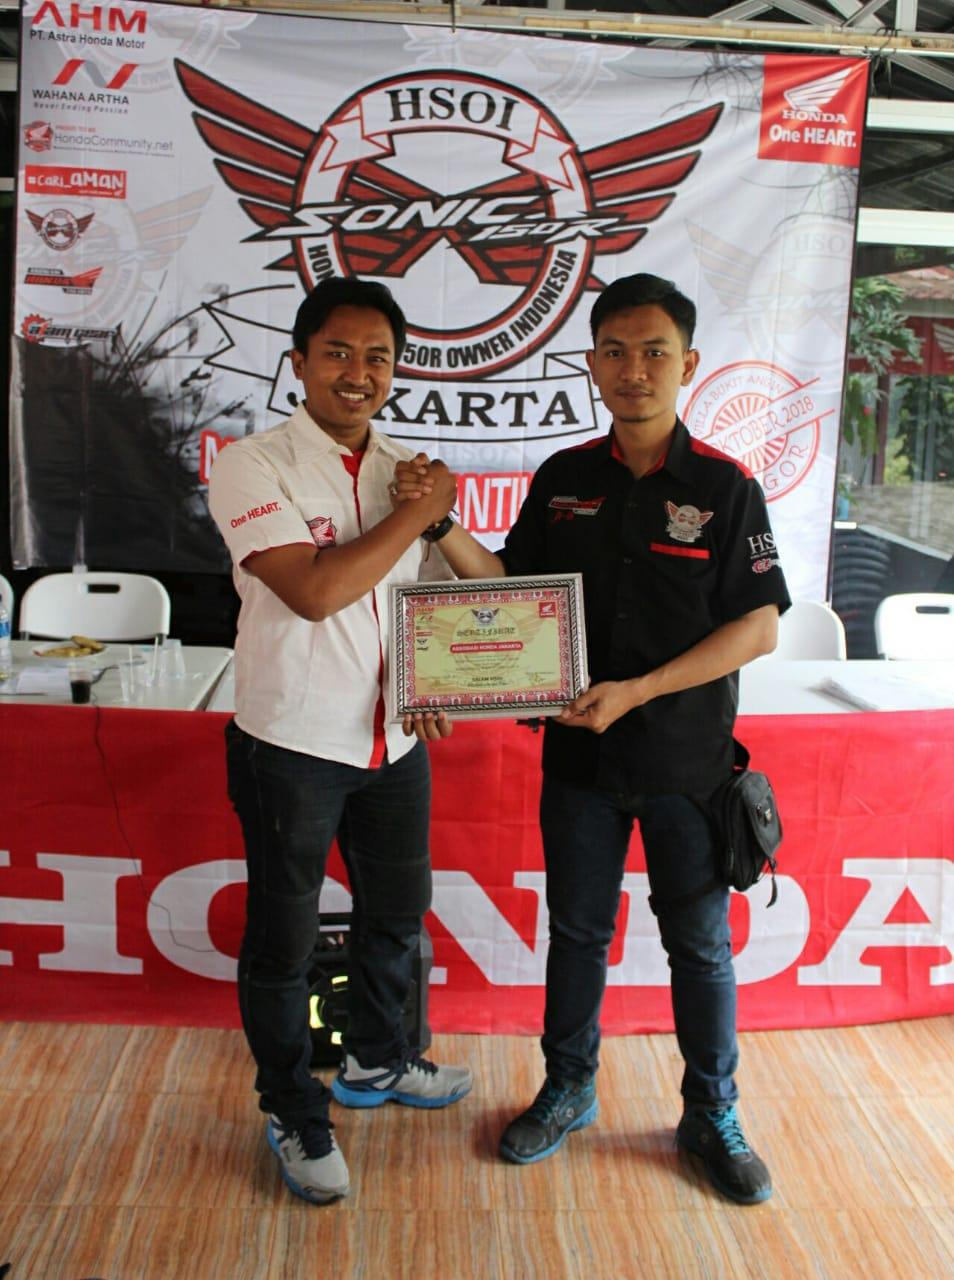 Honda Community Hadirnya Presidium Ahj Memberikan Semangat Mubes Sonic 150r Racing Red Jakarta 09 Oktober 2018 Owner Indonesia Hsoi Pada Sabtu Dan Minggu 06 07 10 Melaksanakan Musyawarah Besar Sekaligus